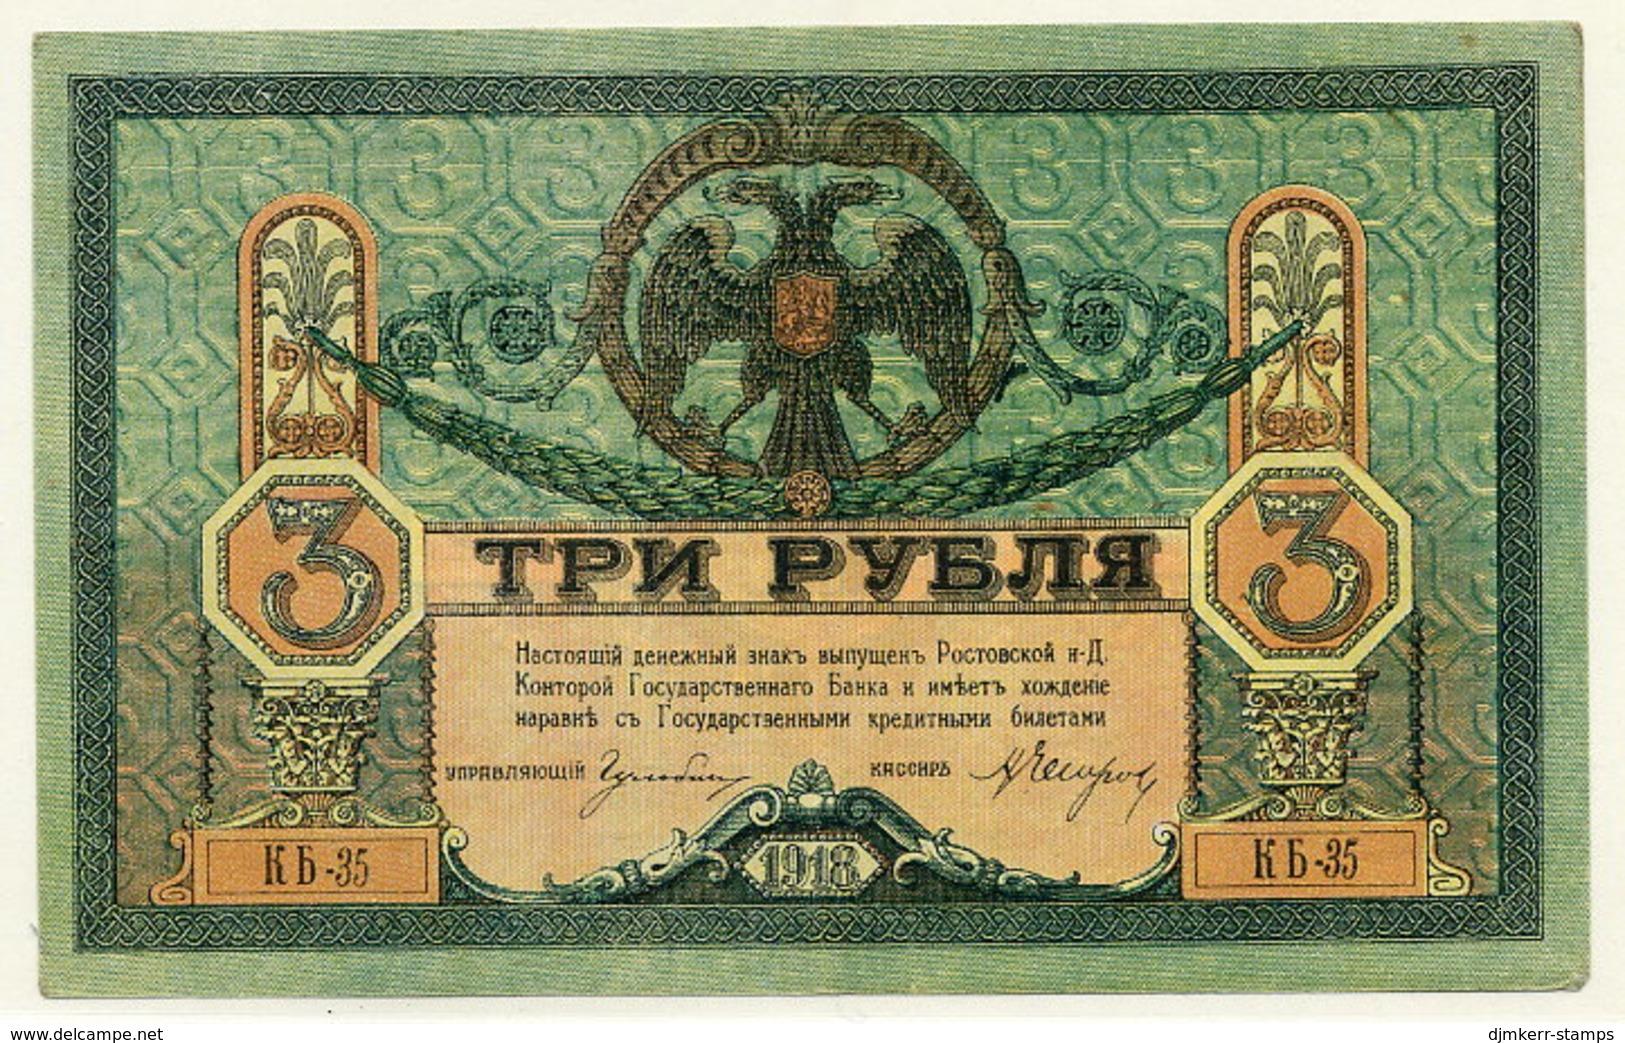 SOUTH RUSSIA 1918  3 Rubles VF  S409a (no Watermark) - Russia